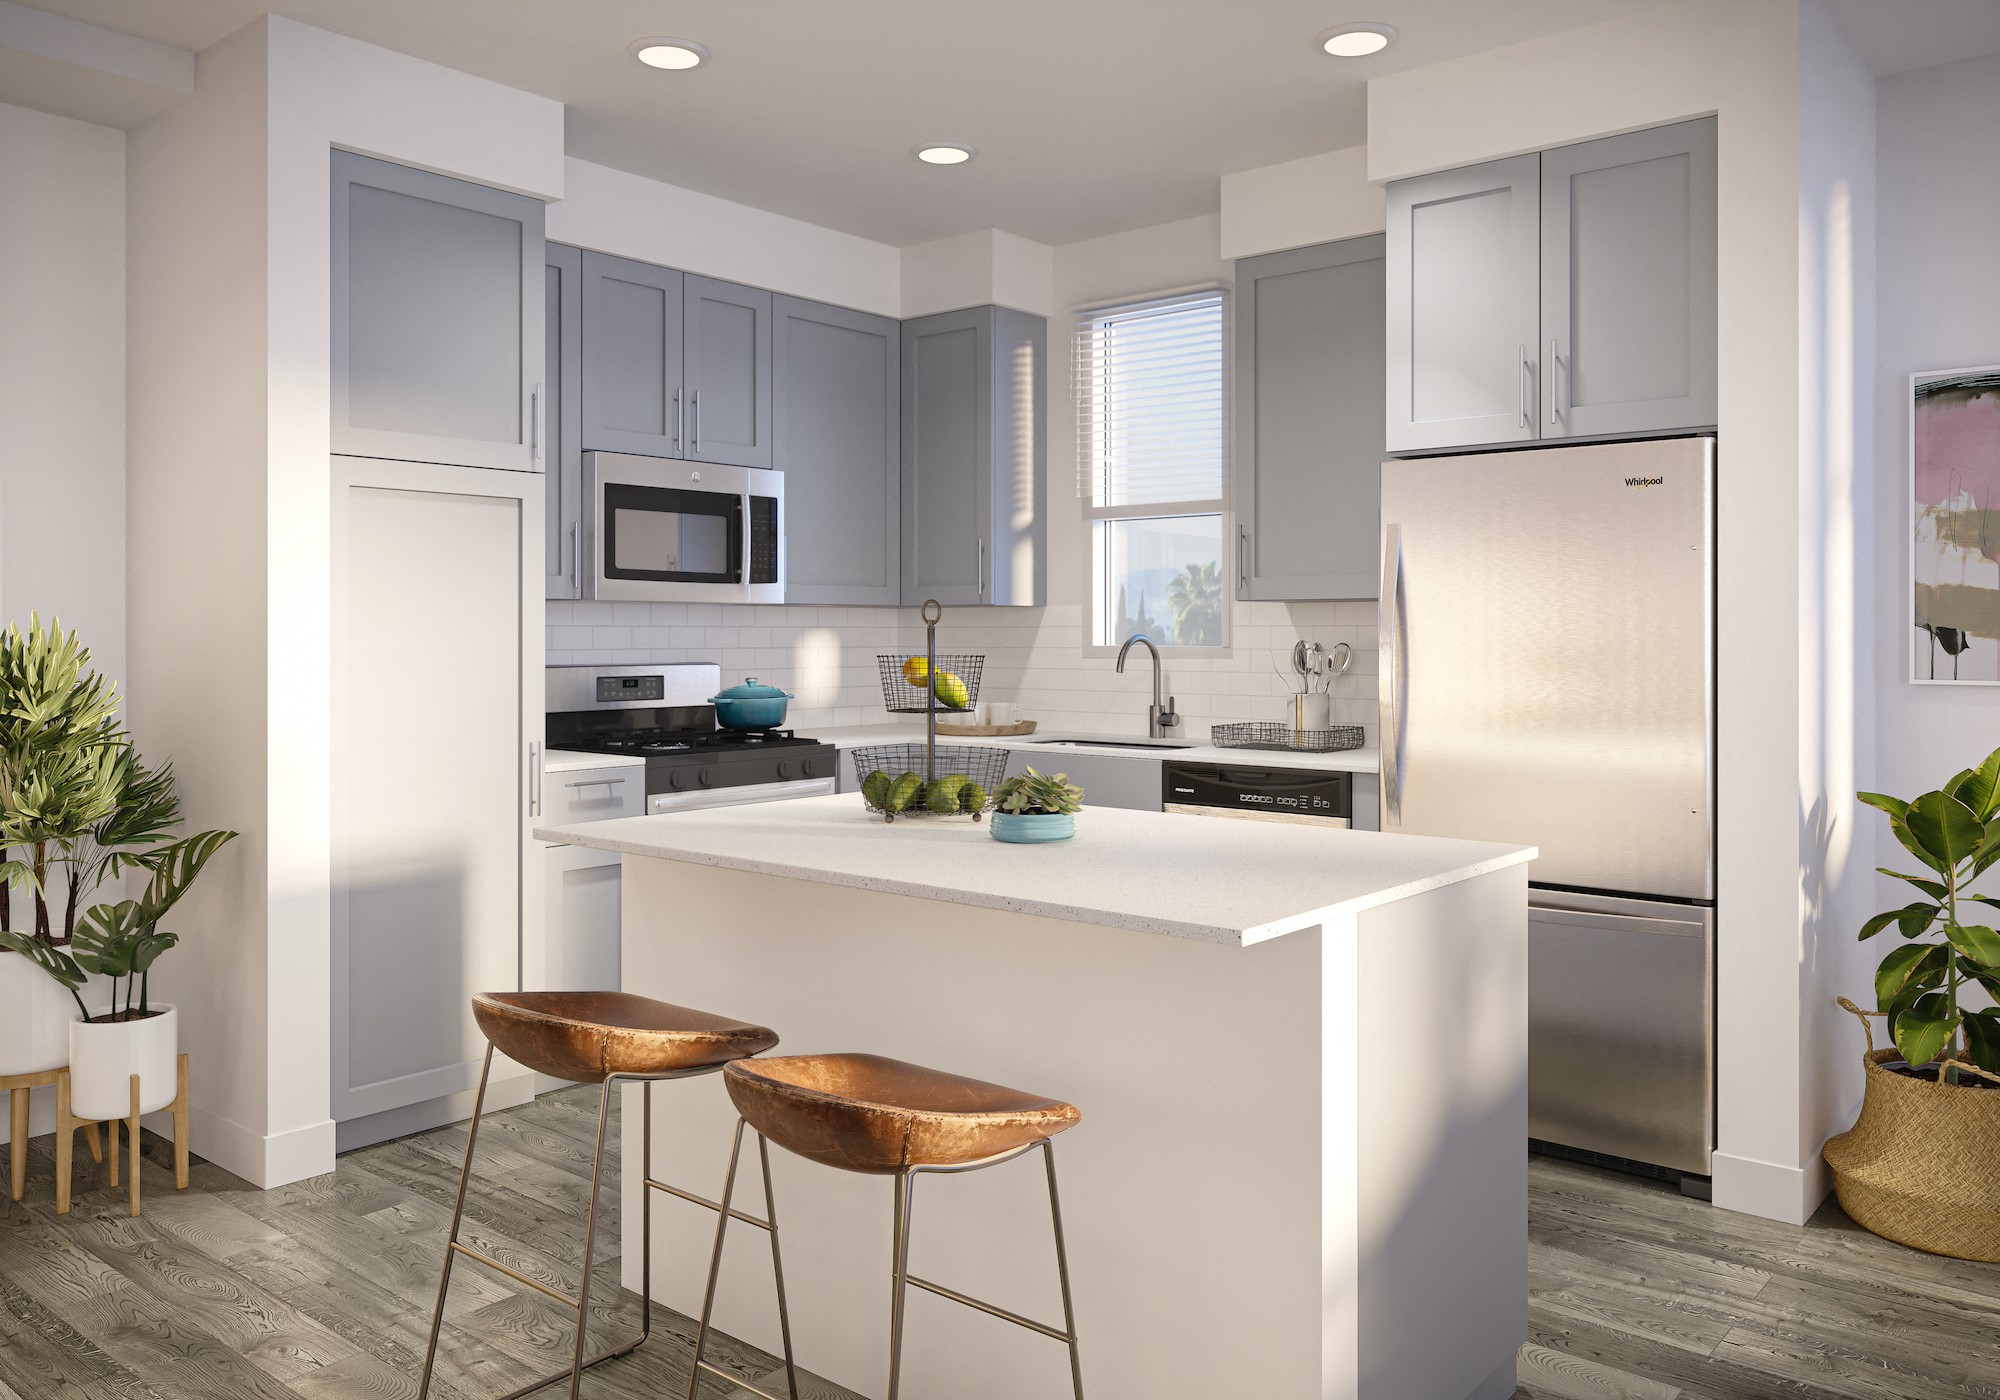 Lincoln Village Apartment Homes photo